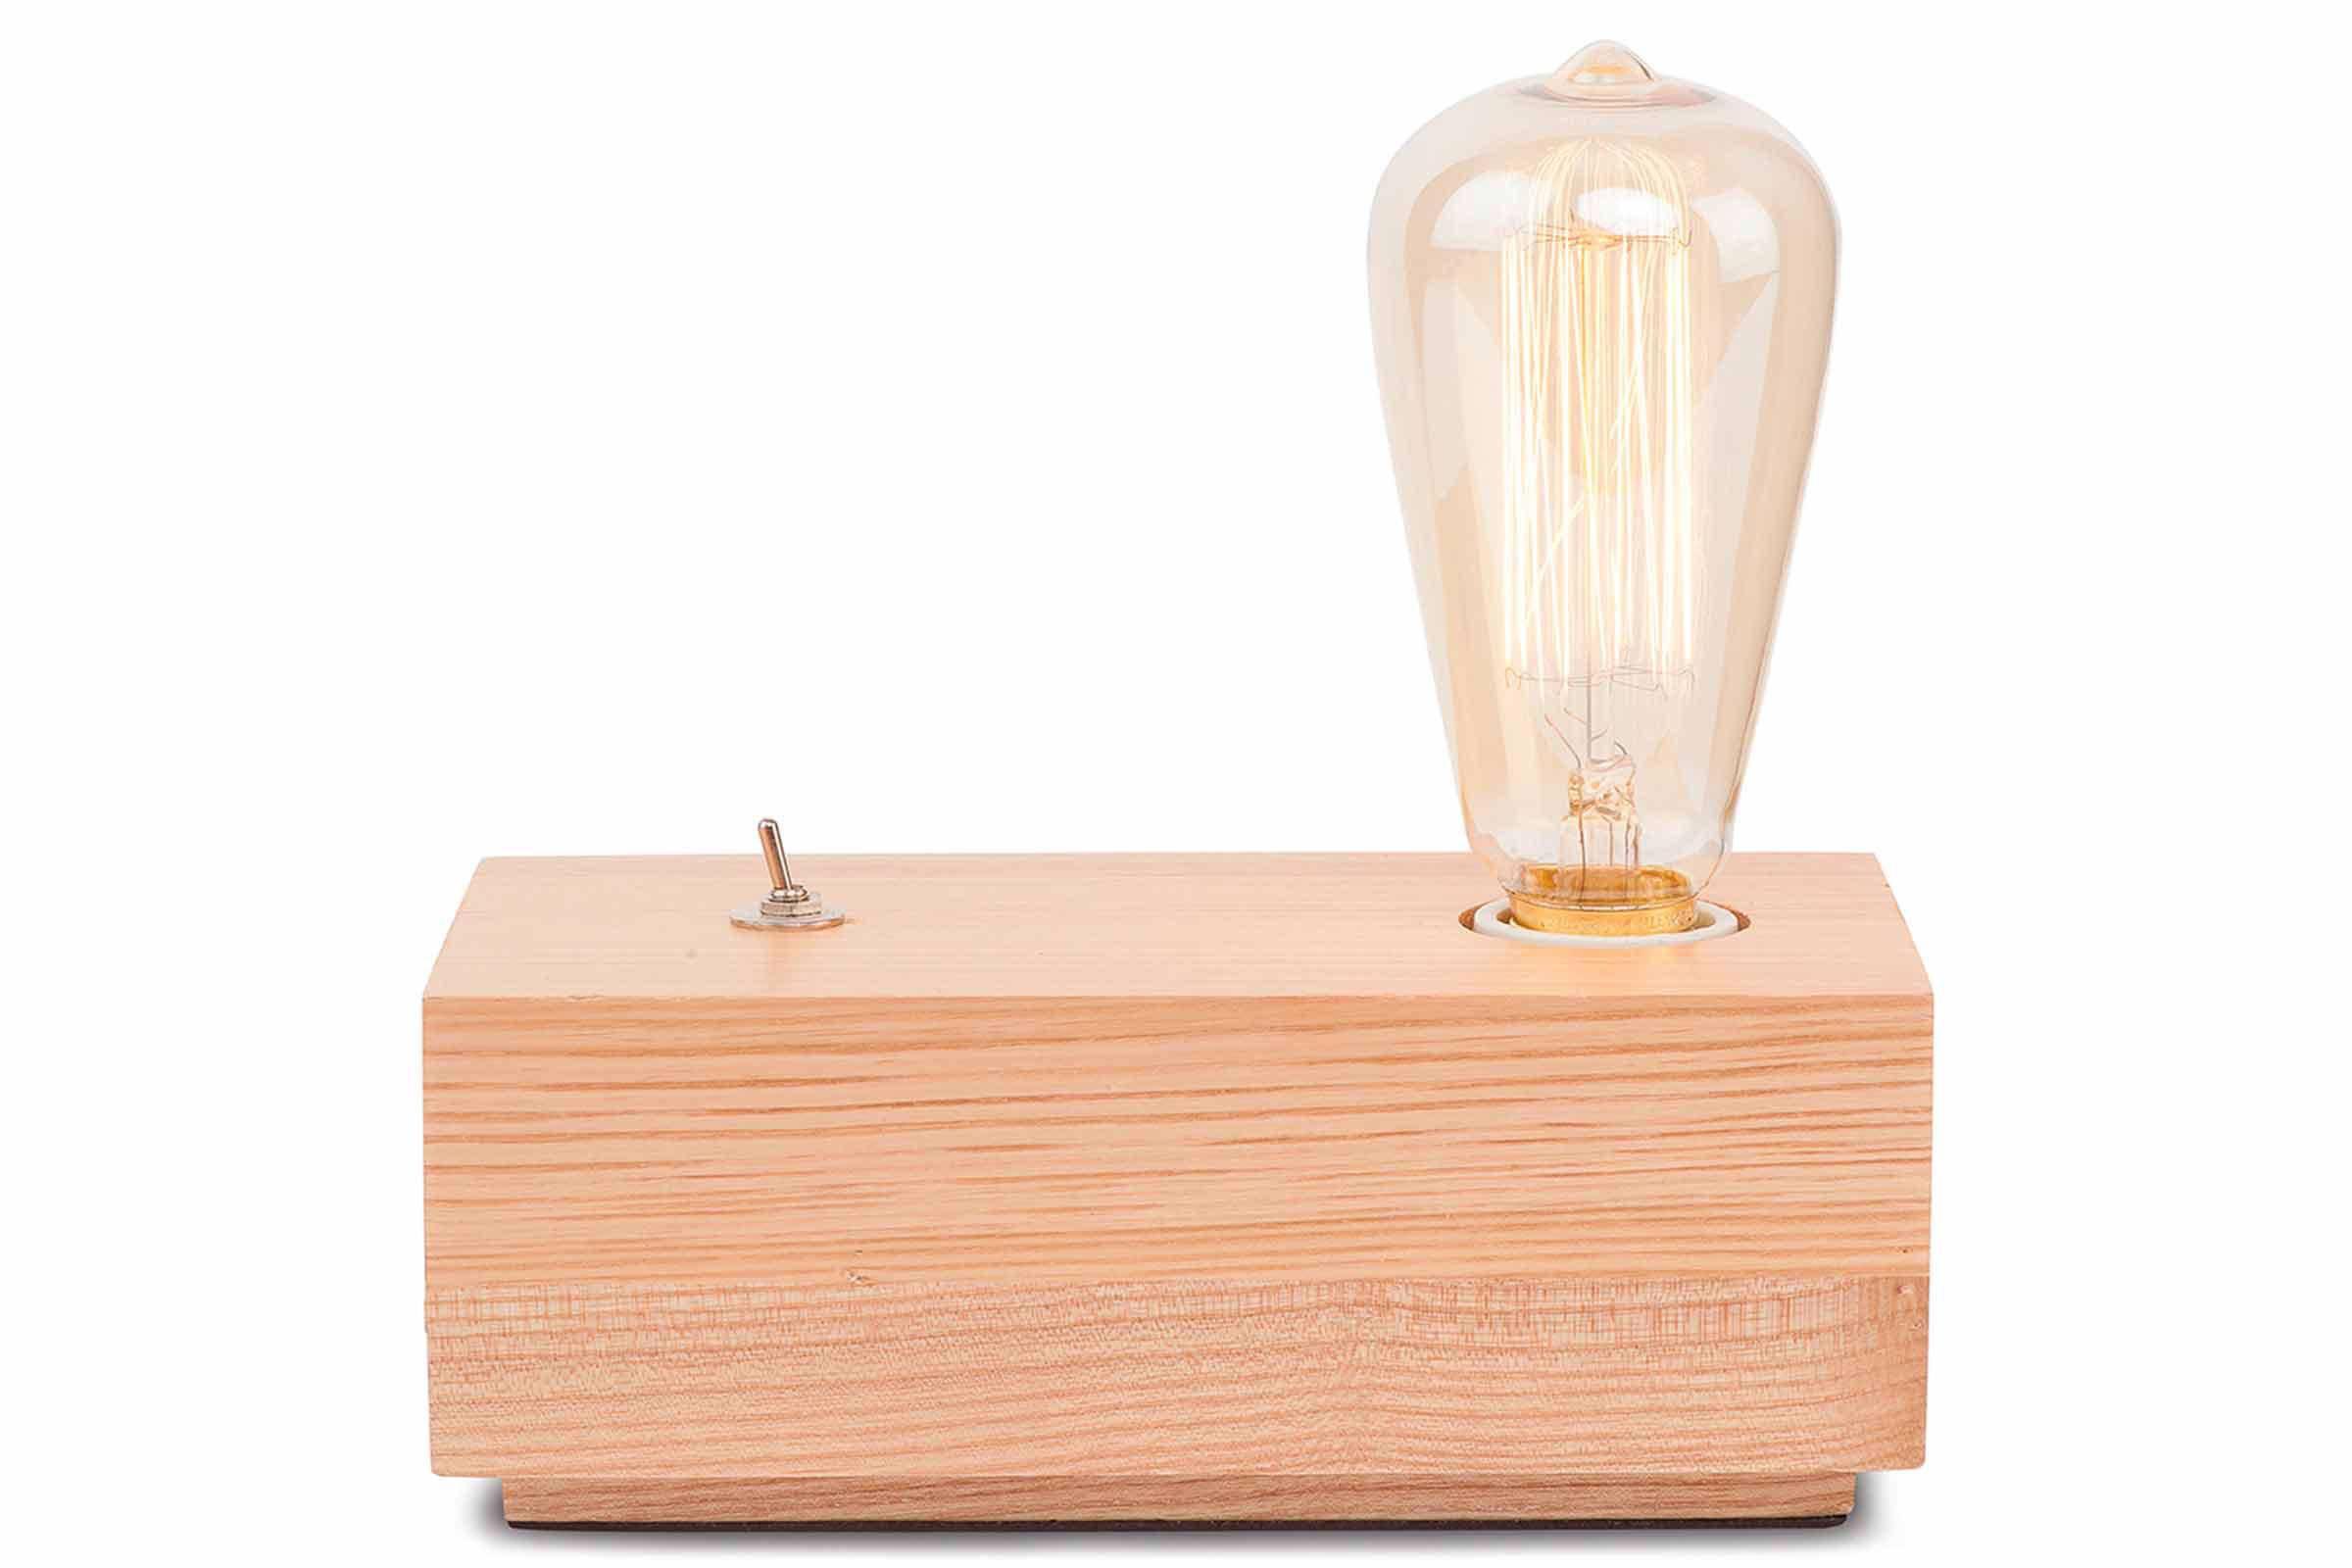 Bamboe Lampenkap Xl : Sale: lampen bij wehkamp gratis bezorging vanaf 20.